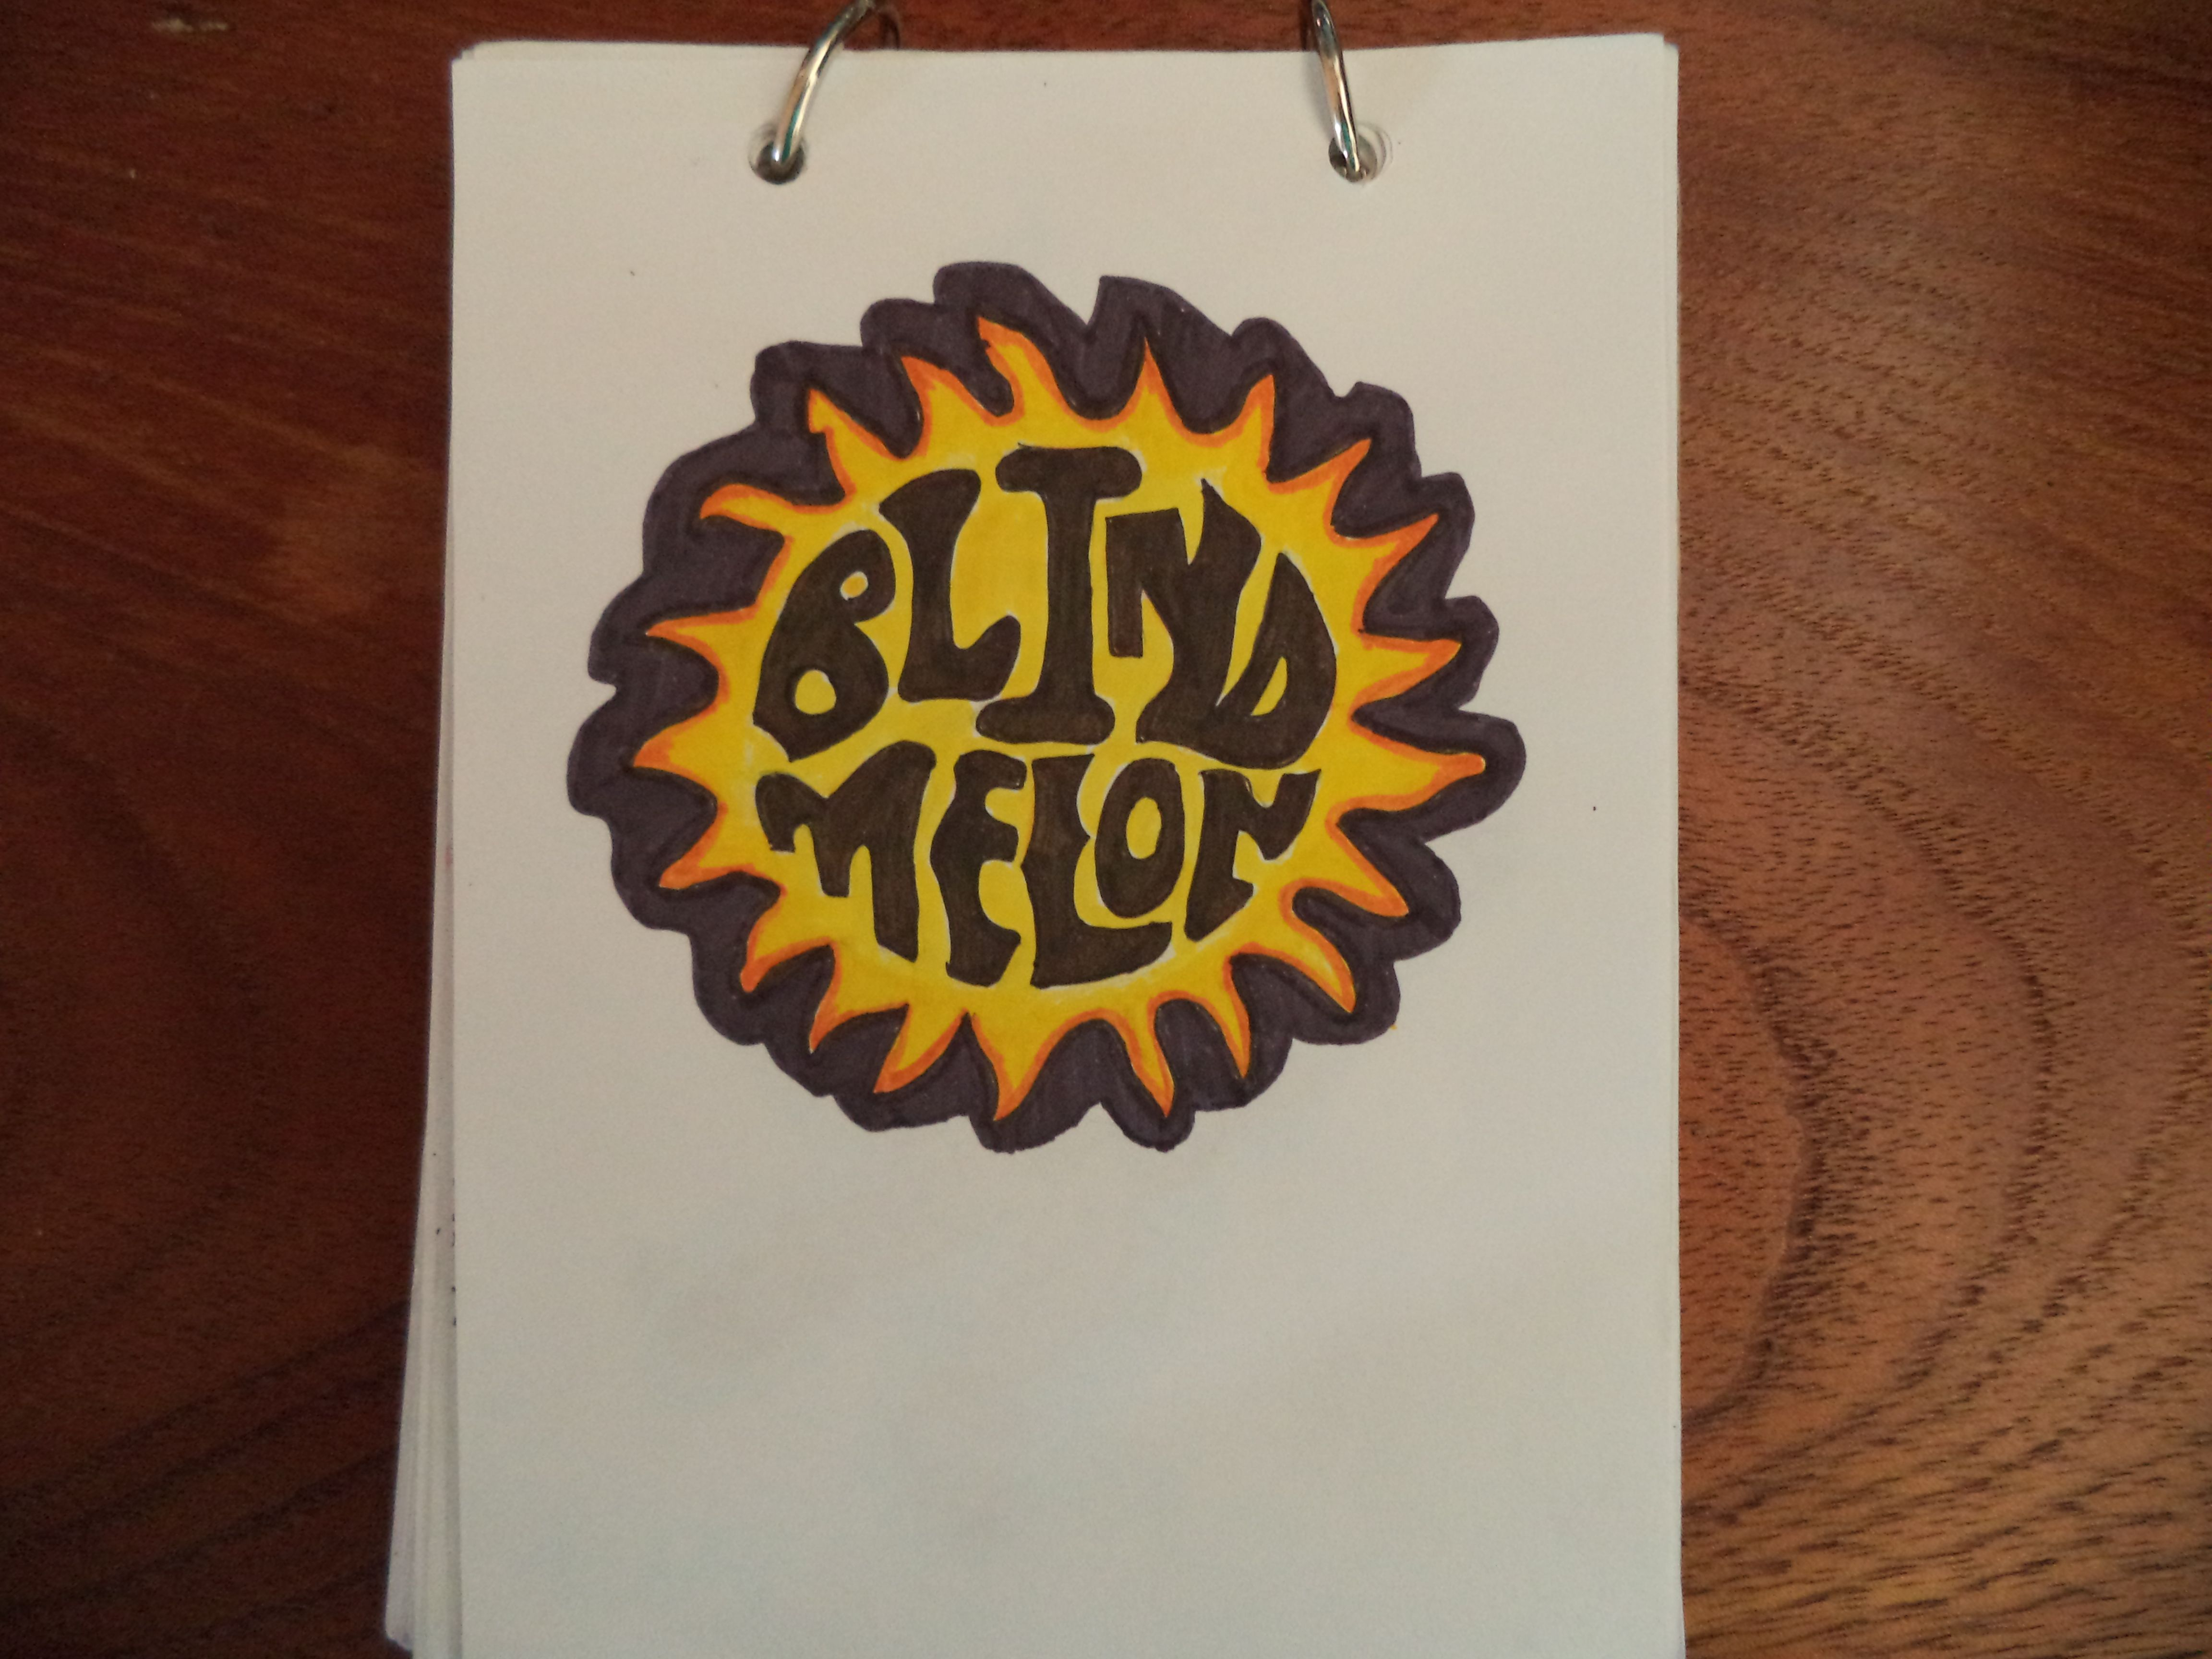 Blind melon logo